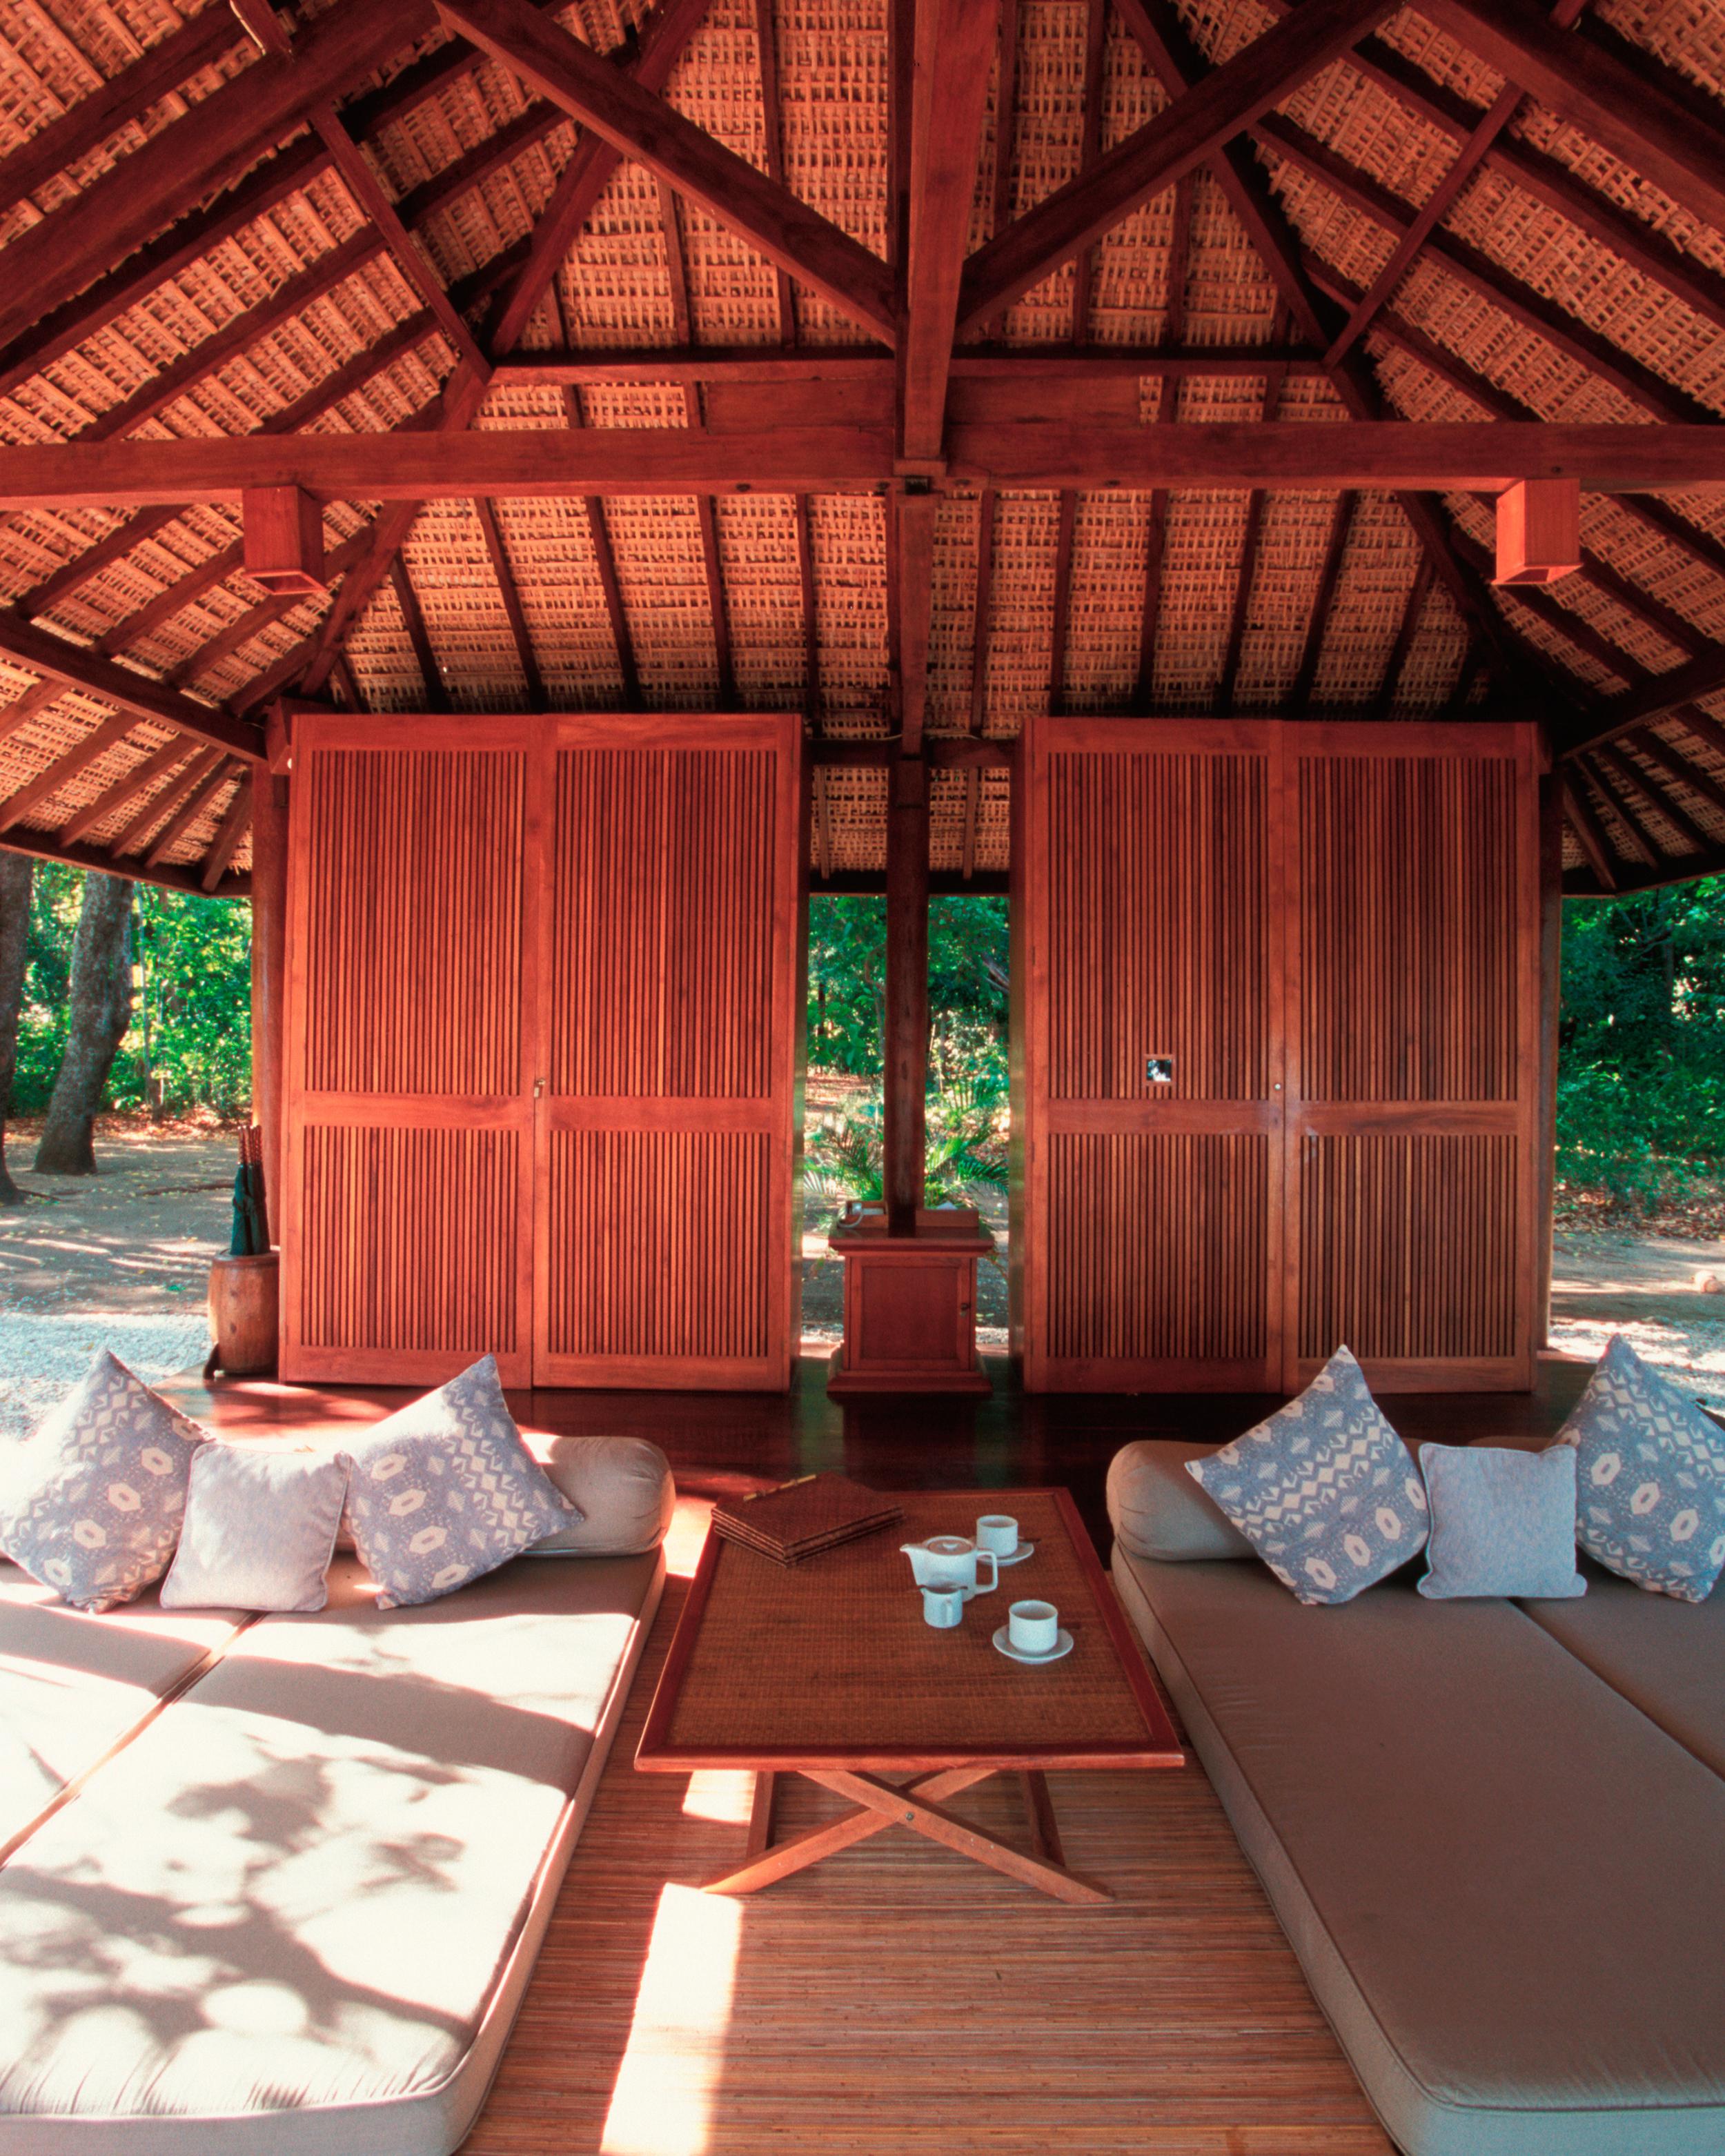 private-island-resorts-mms-amanwana-moyo-island-indonesia-1214.jpg